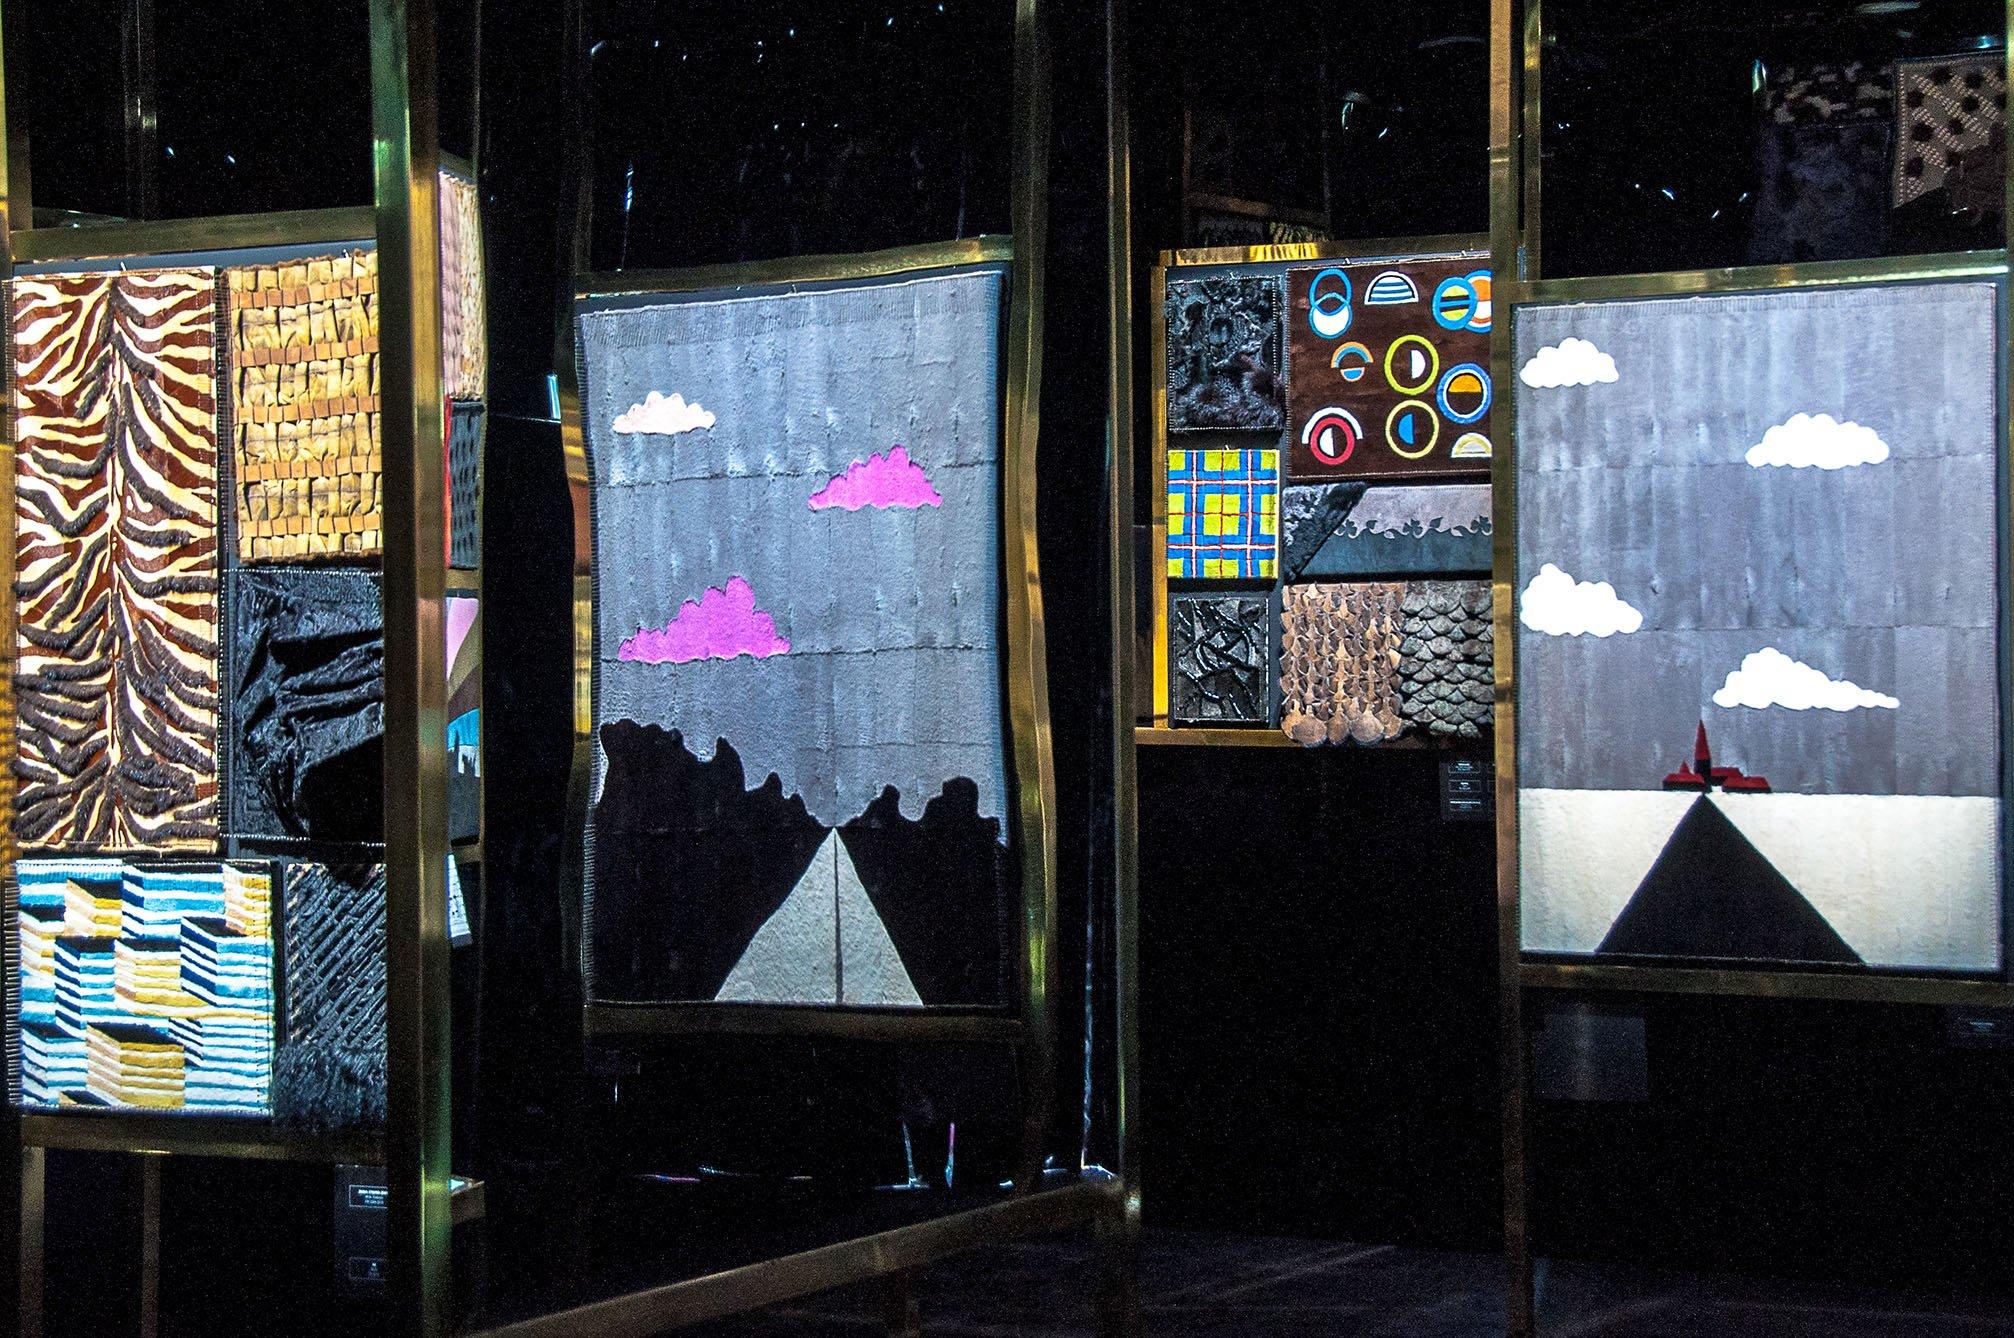 La mostra The Artisans of Dreams